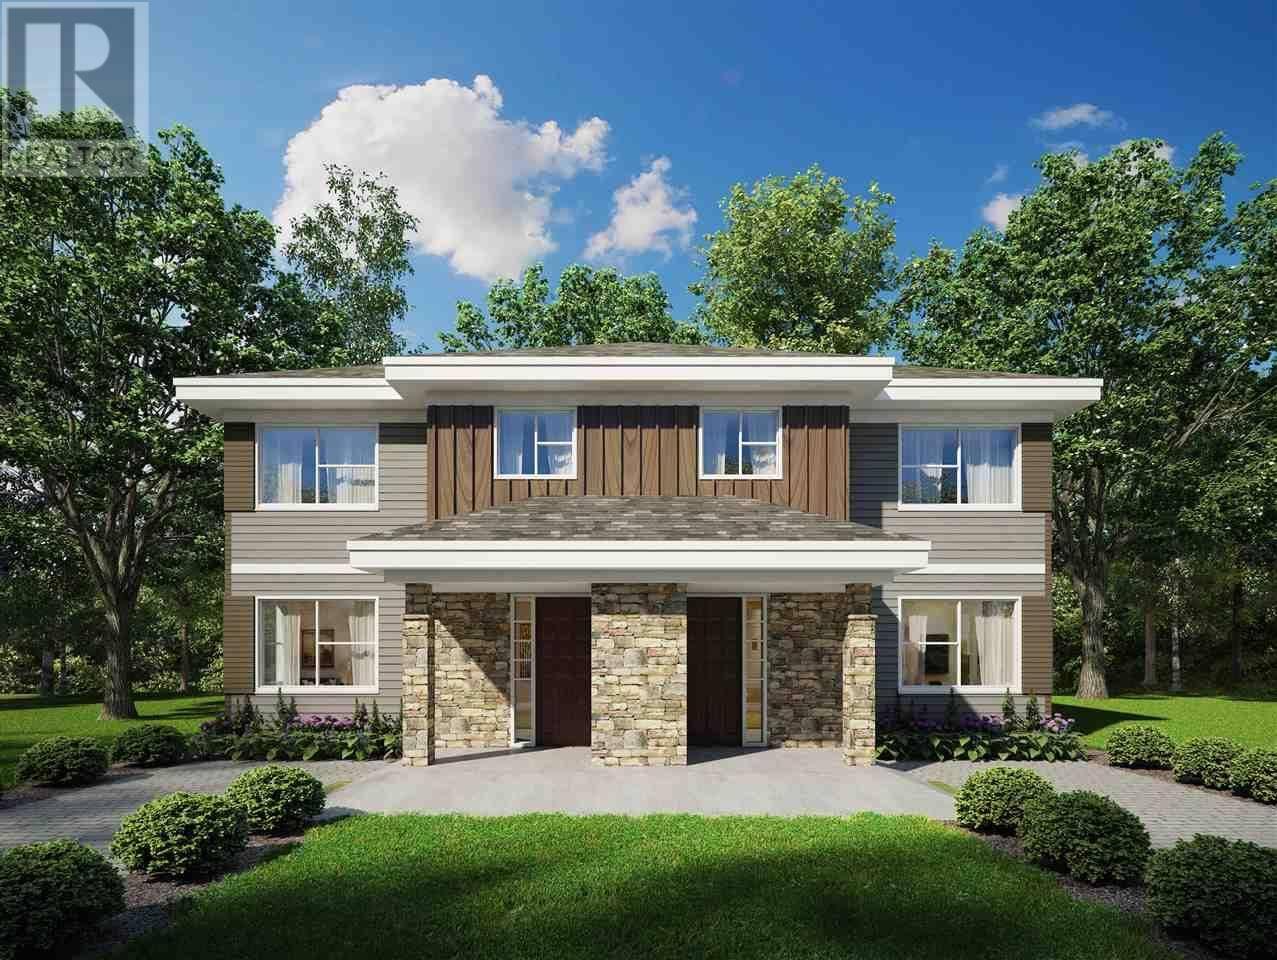 House for sale at 758 Herring Cove Rd Unit B Herring Cove Nova Scotia - MLS: 201919221